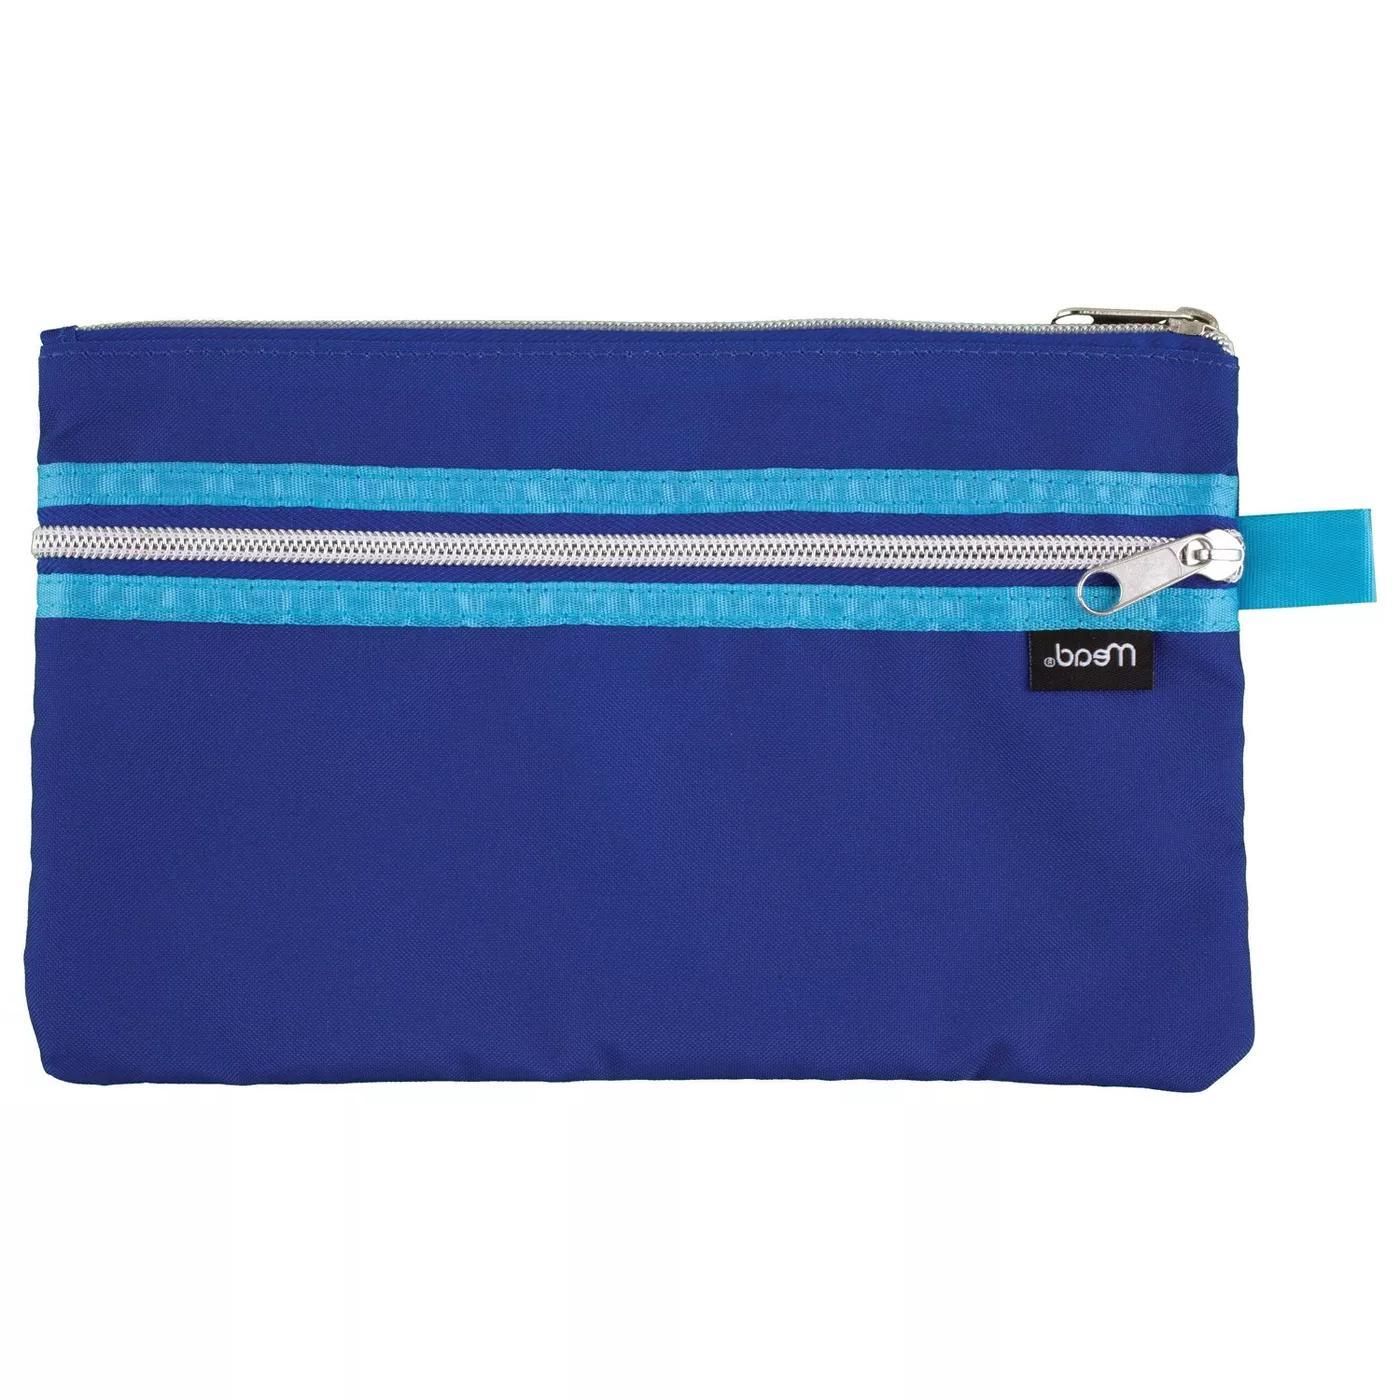 mead 2 zipper wr focal pencil pouch